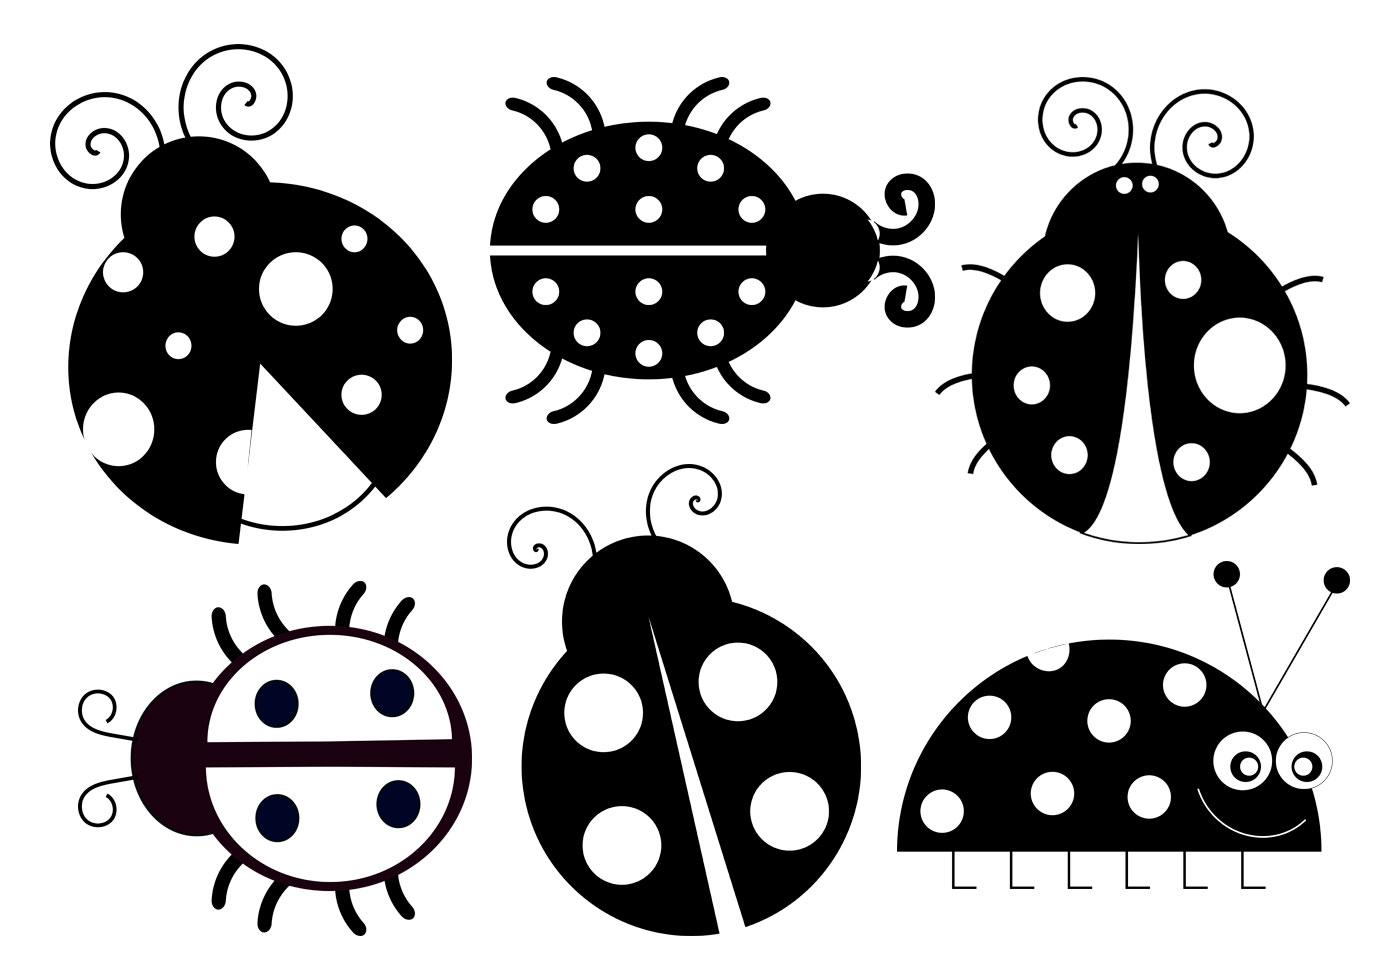 Cute Ladybug Brushes Collection